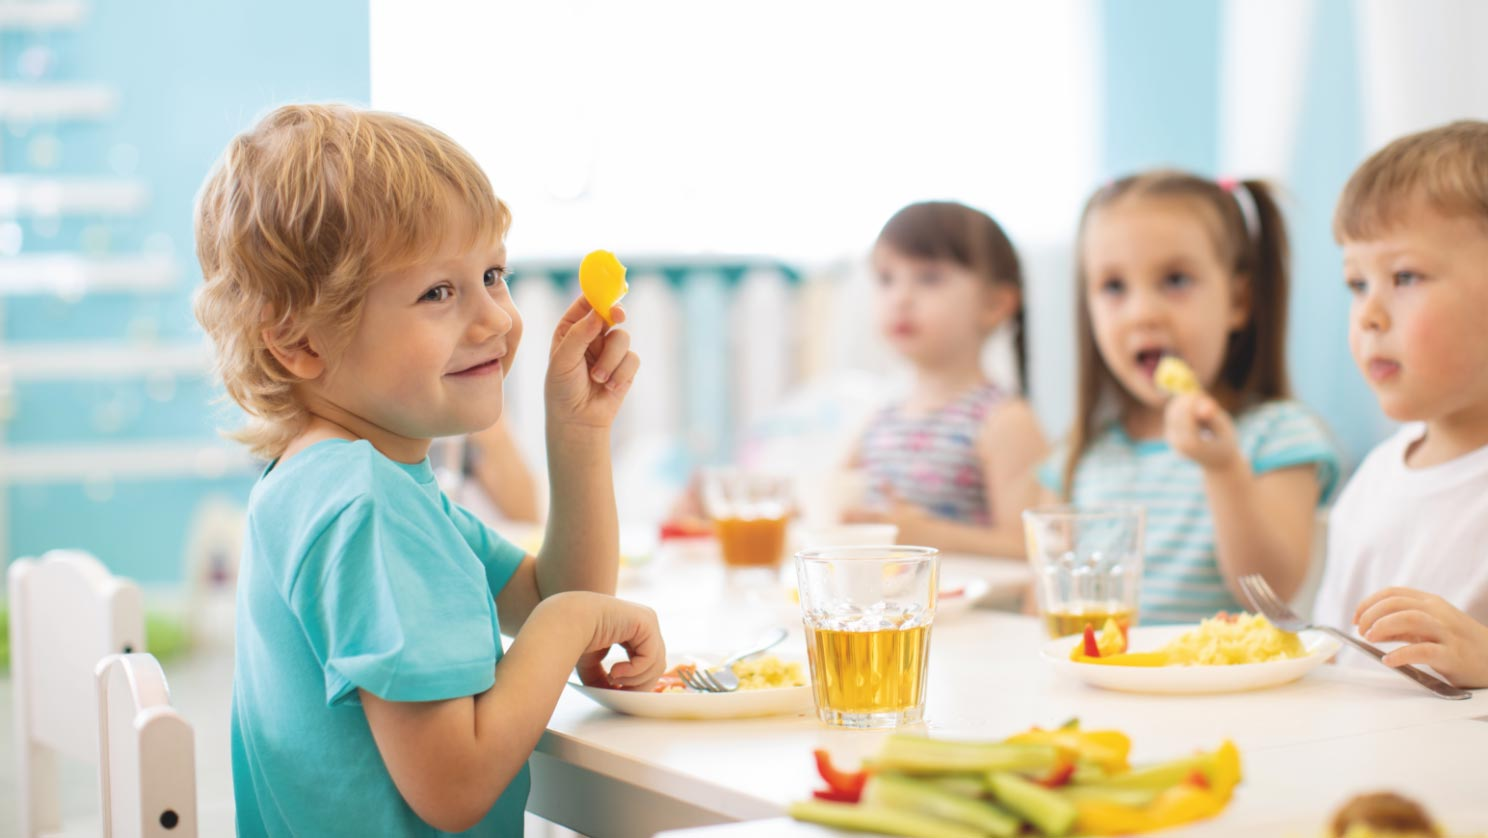 childrens food safety